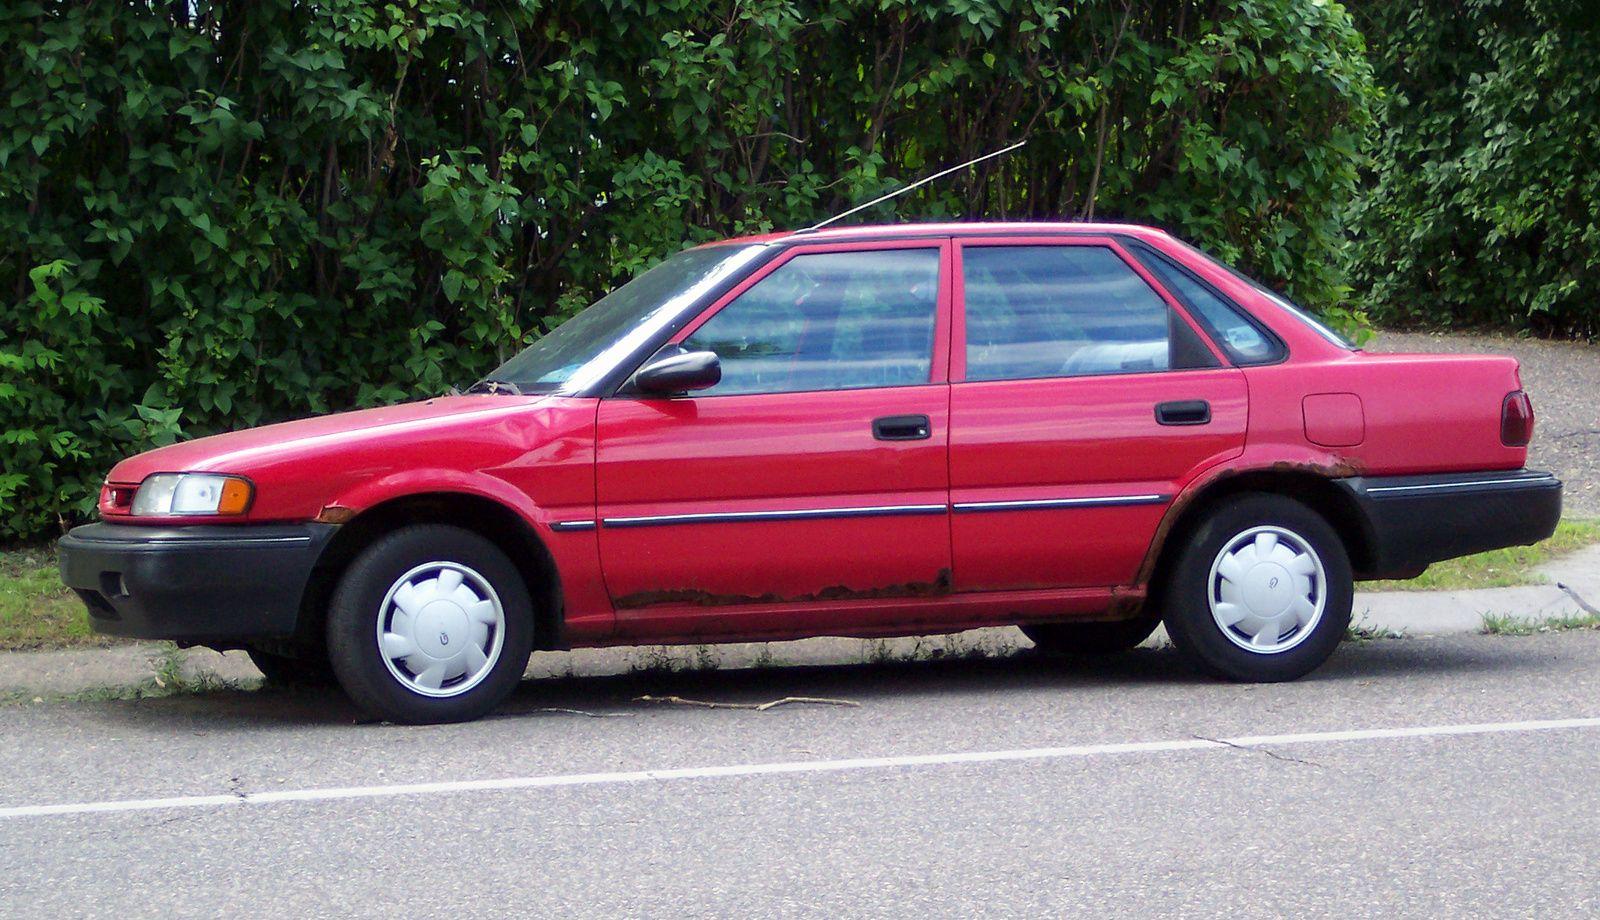 medium resolution of 1992 geo prizm car 4 hated this car